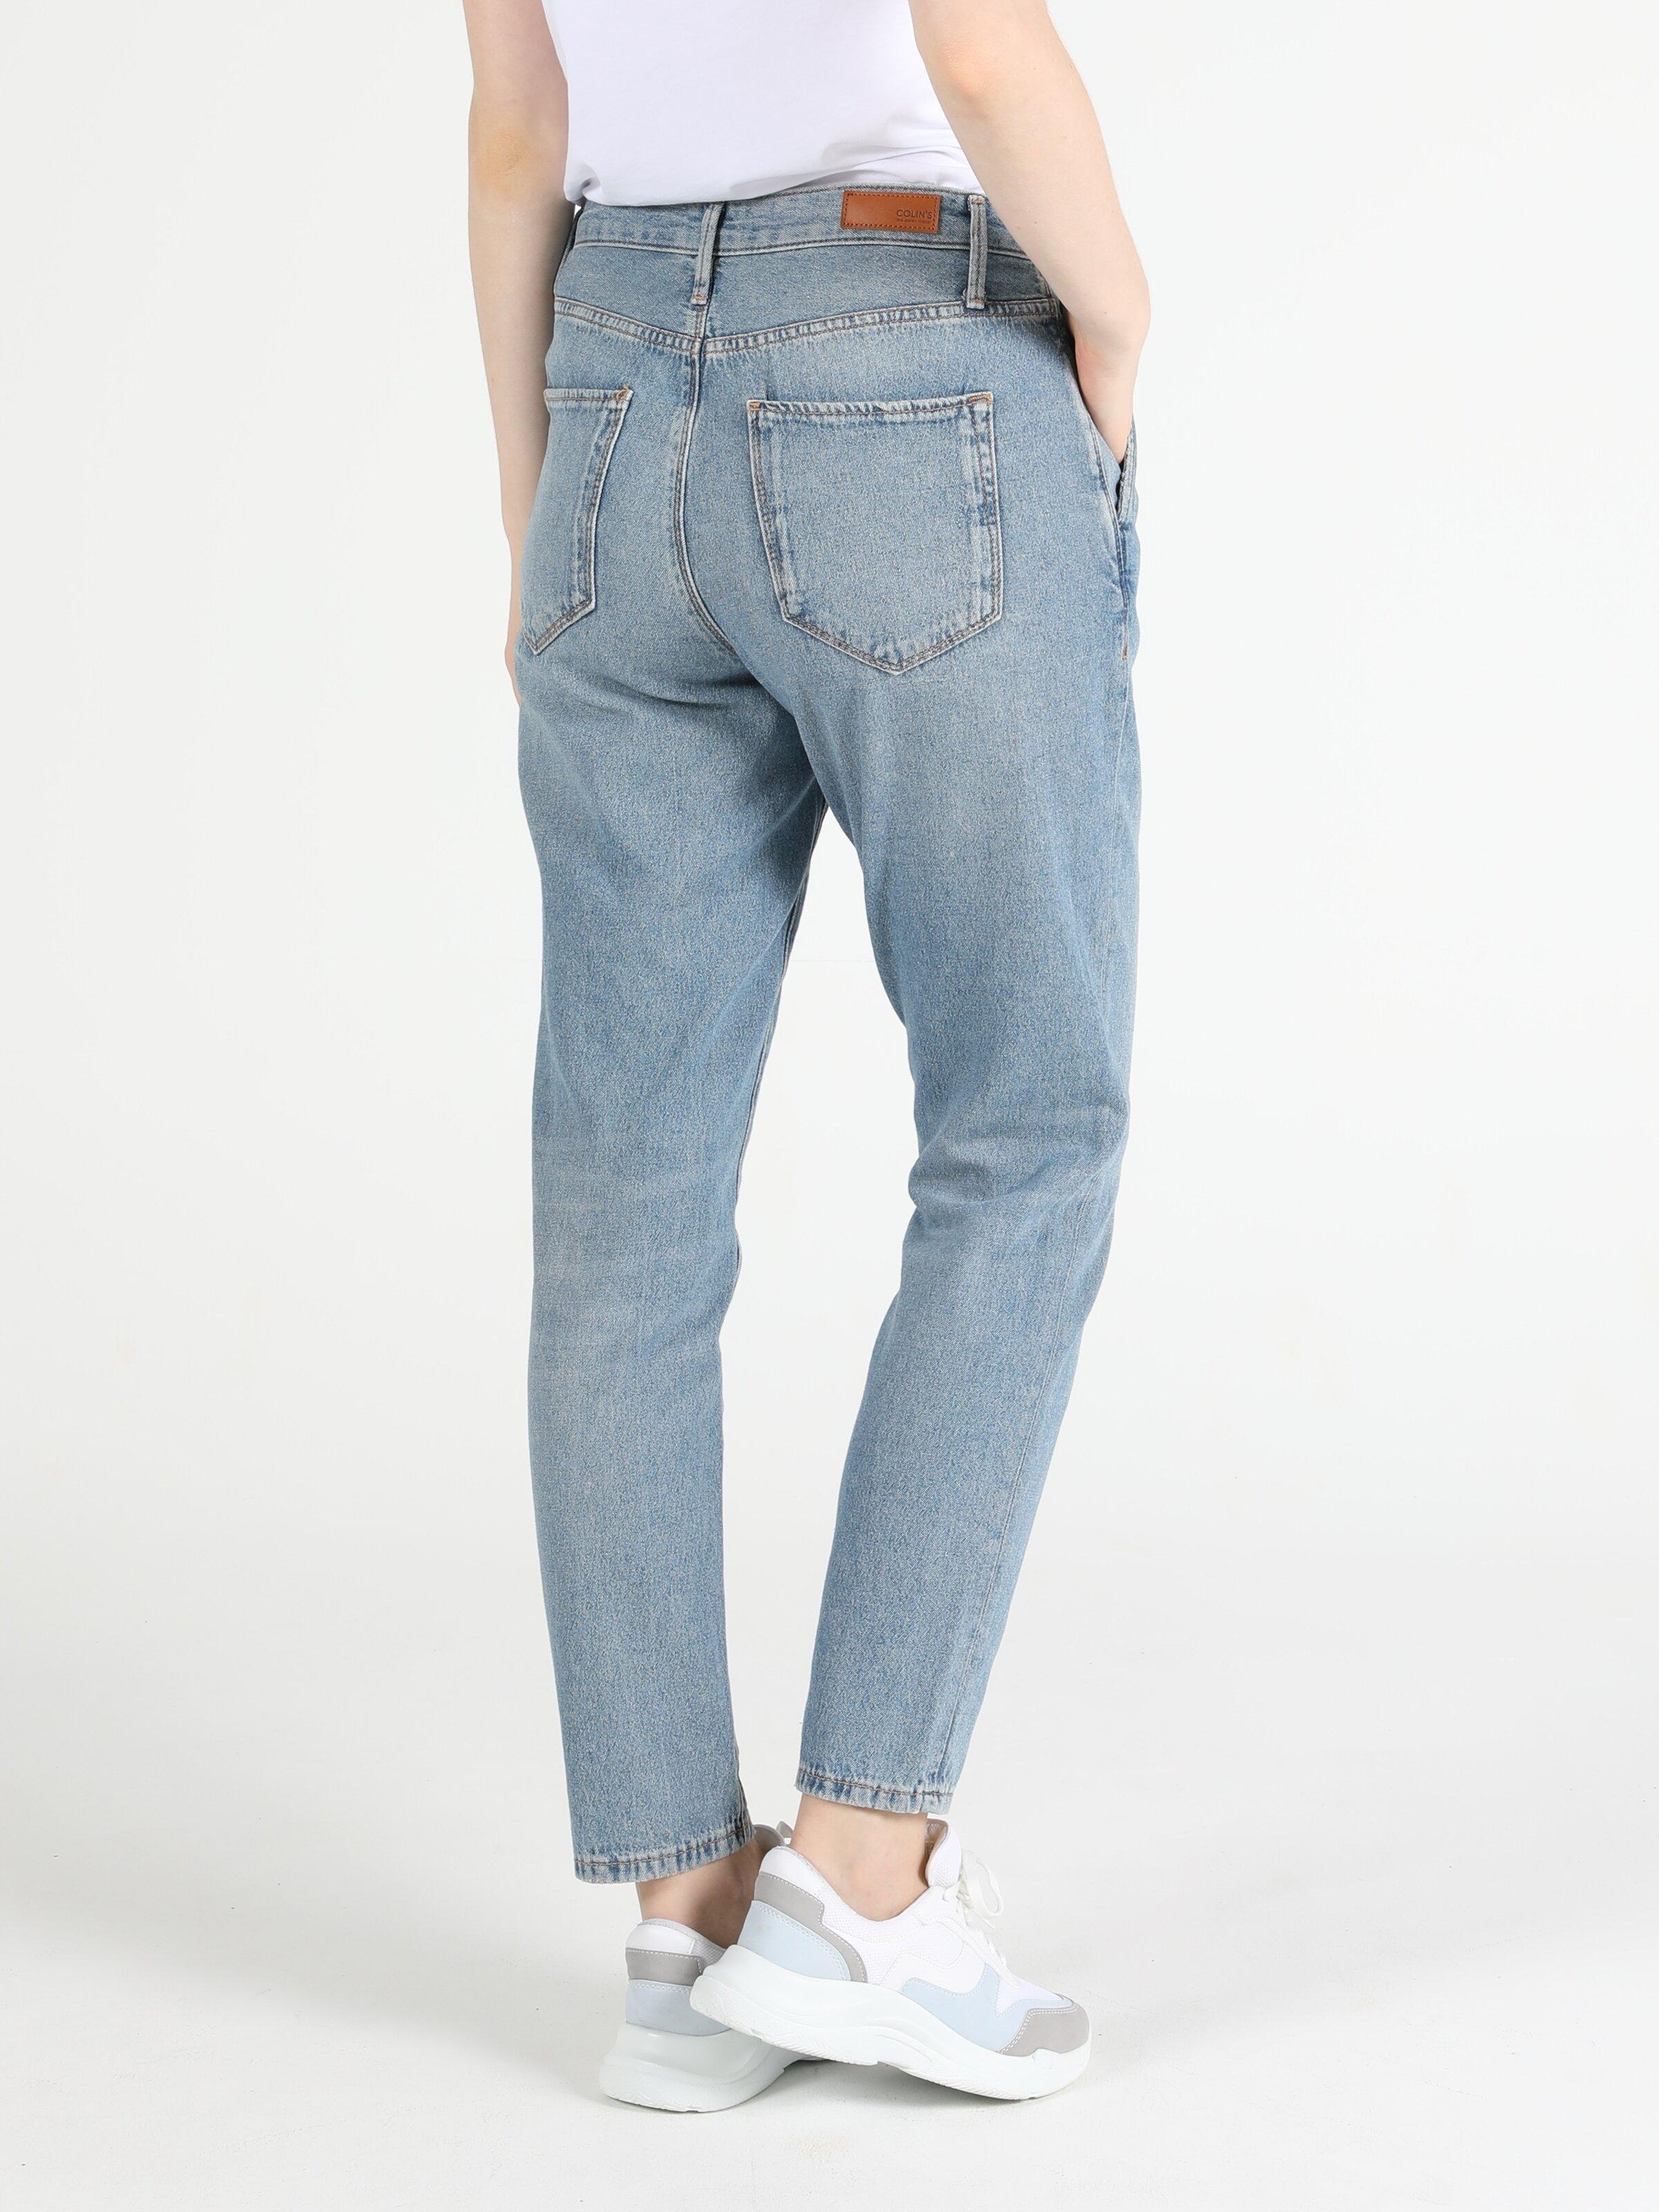 Tesa Orta Bel Daralan Paça Chıno Jean Kadın Jean Pantolon